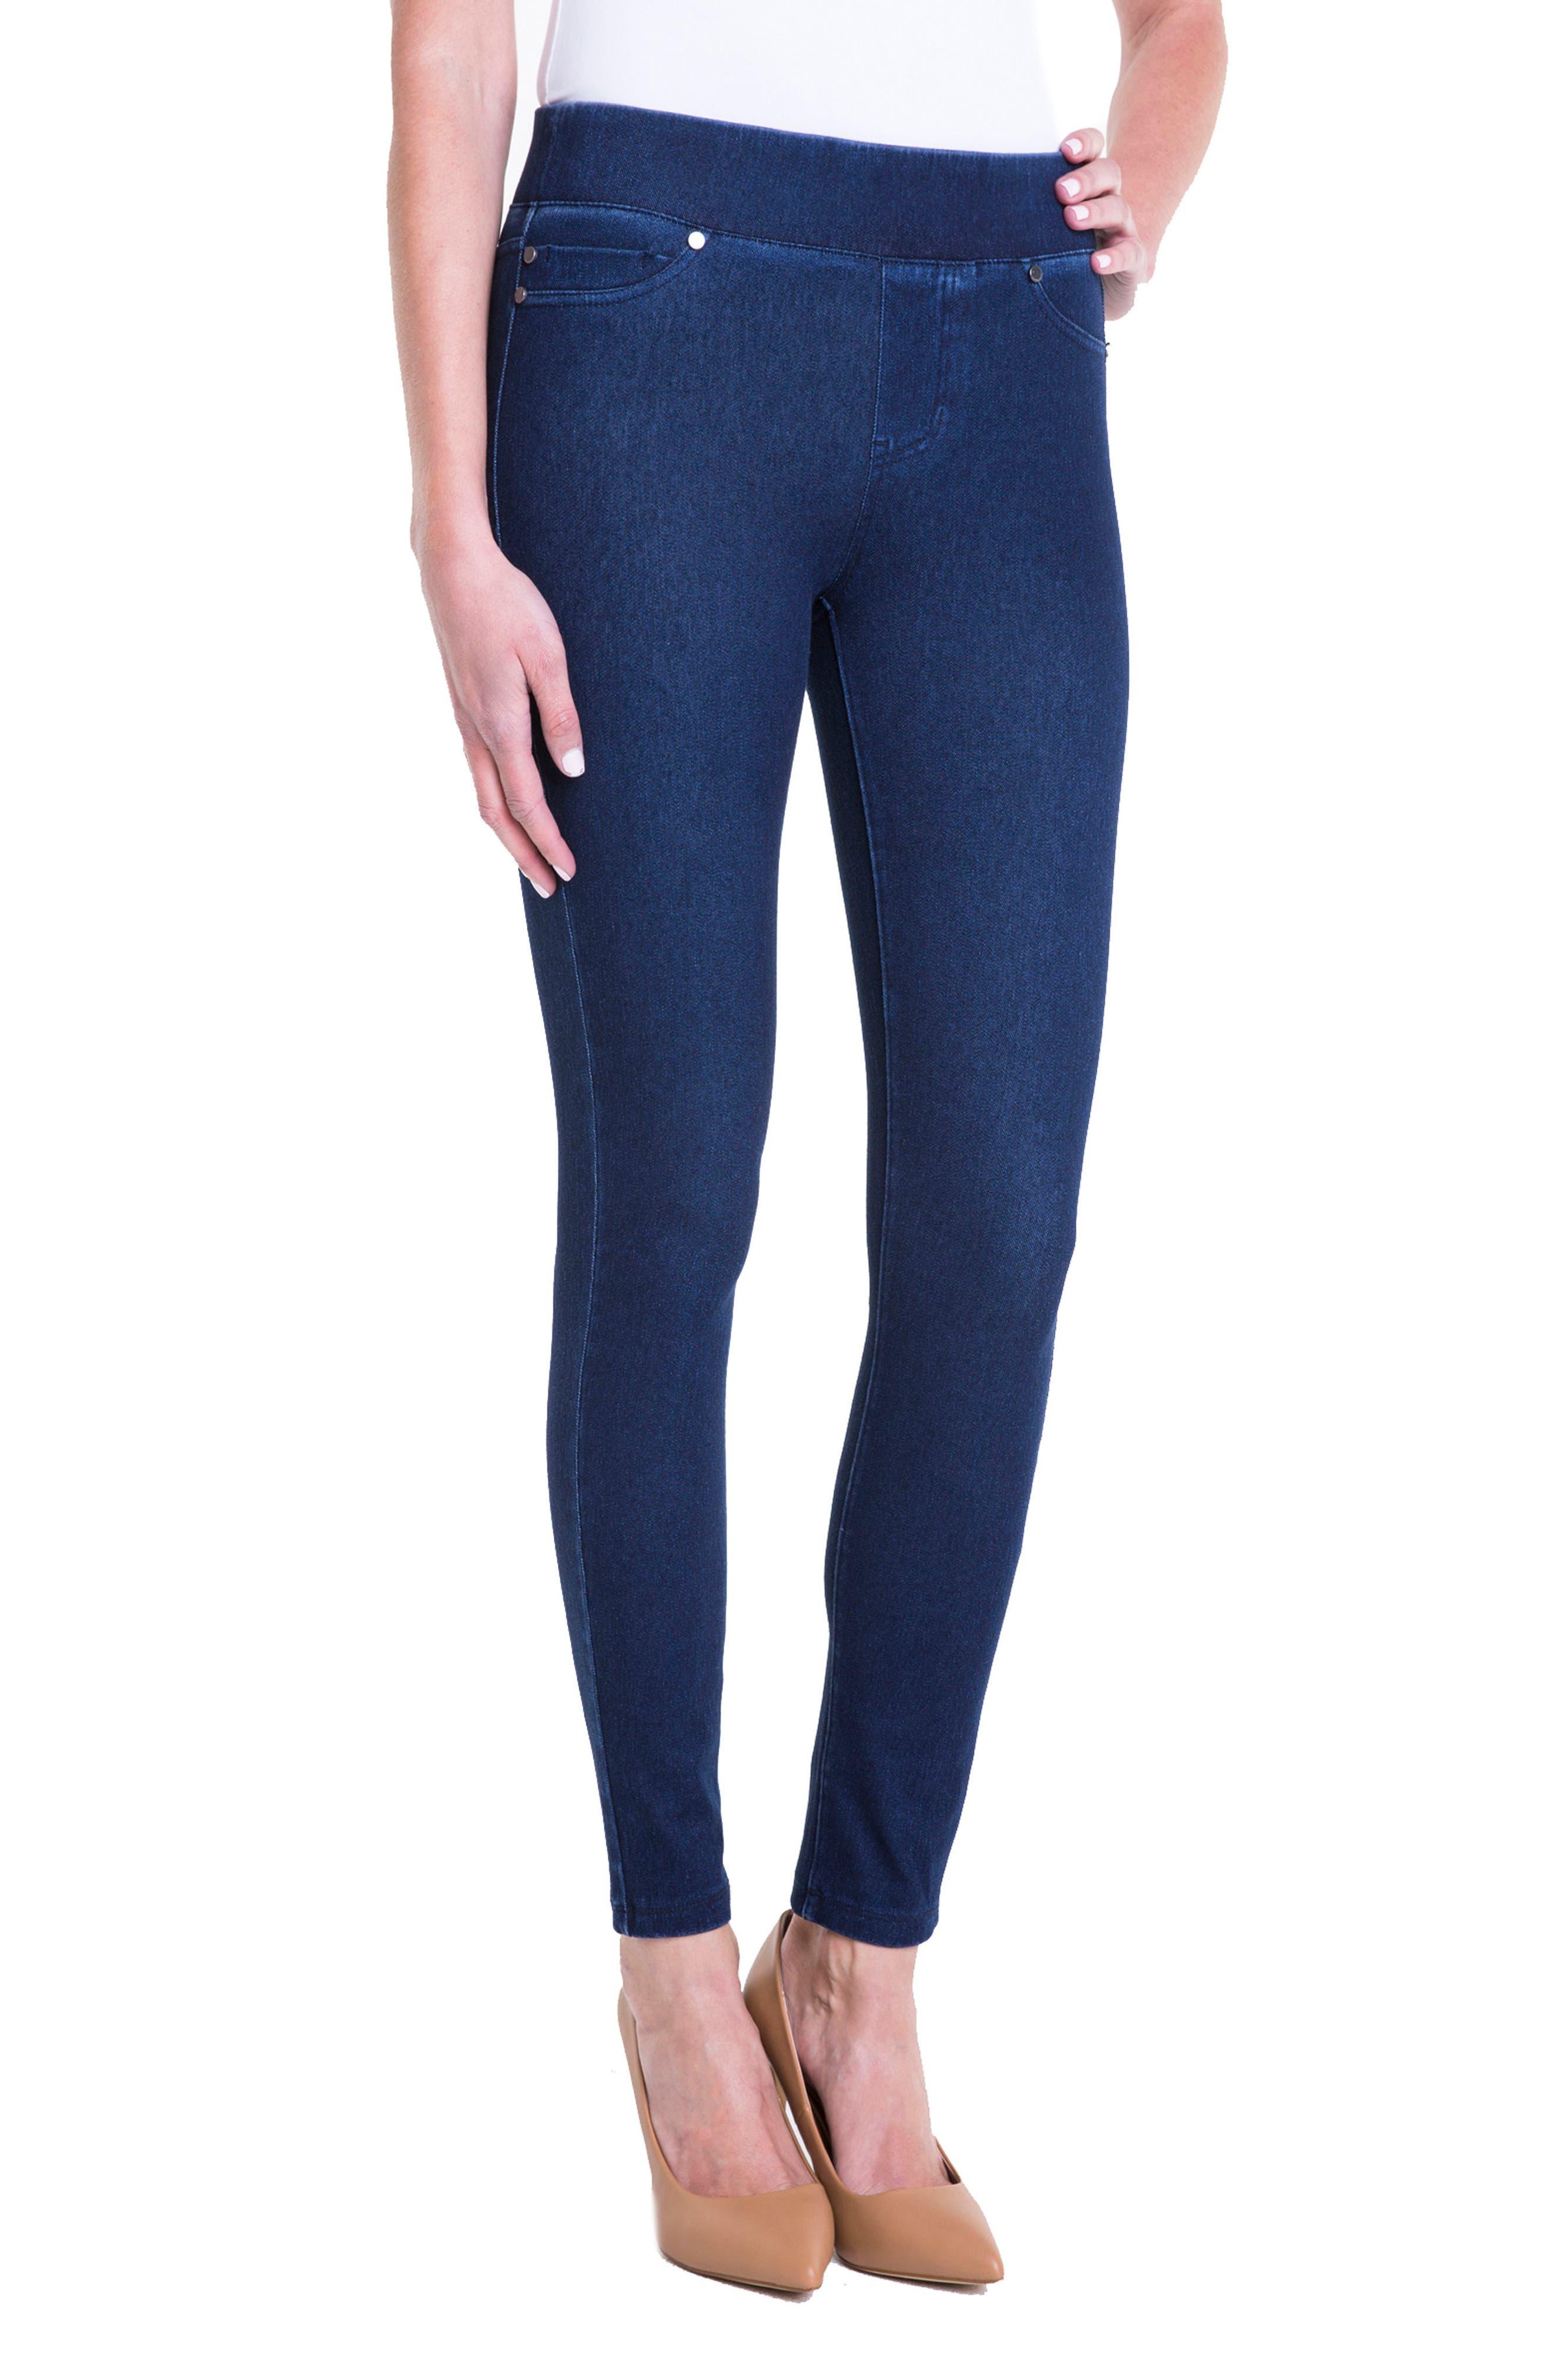 Sienna Pull-On Ankle Legging Jeans,                             Alternate thumbnail 3, color,                             403